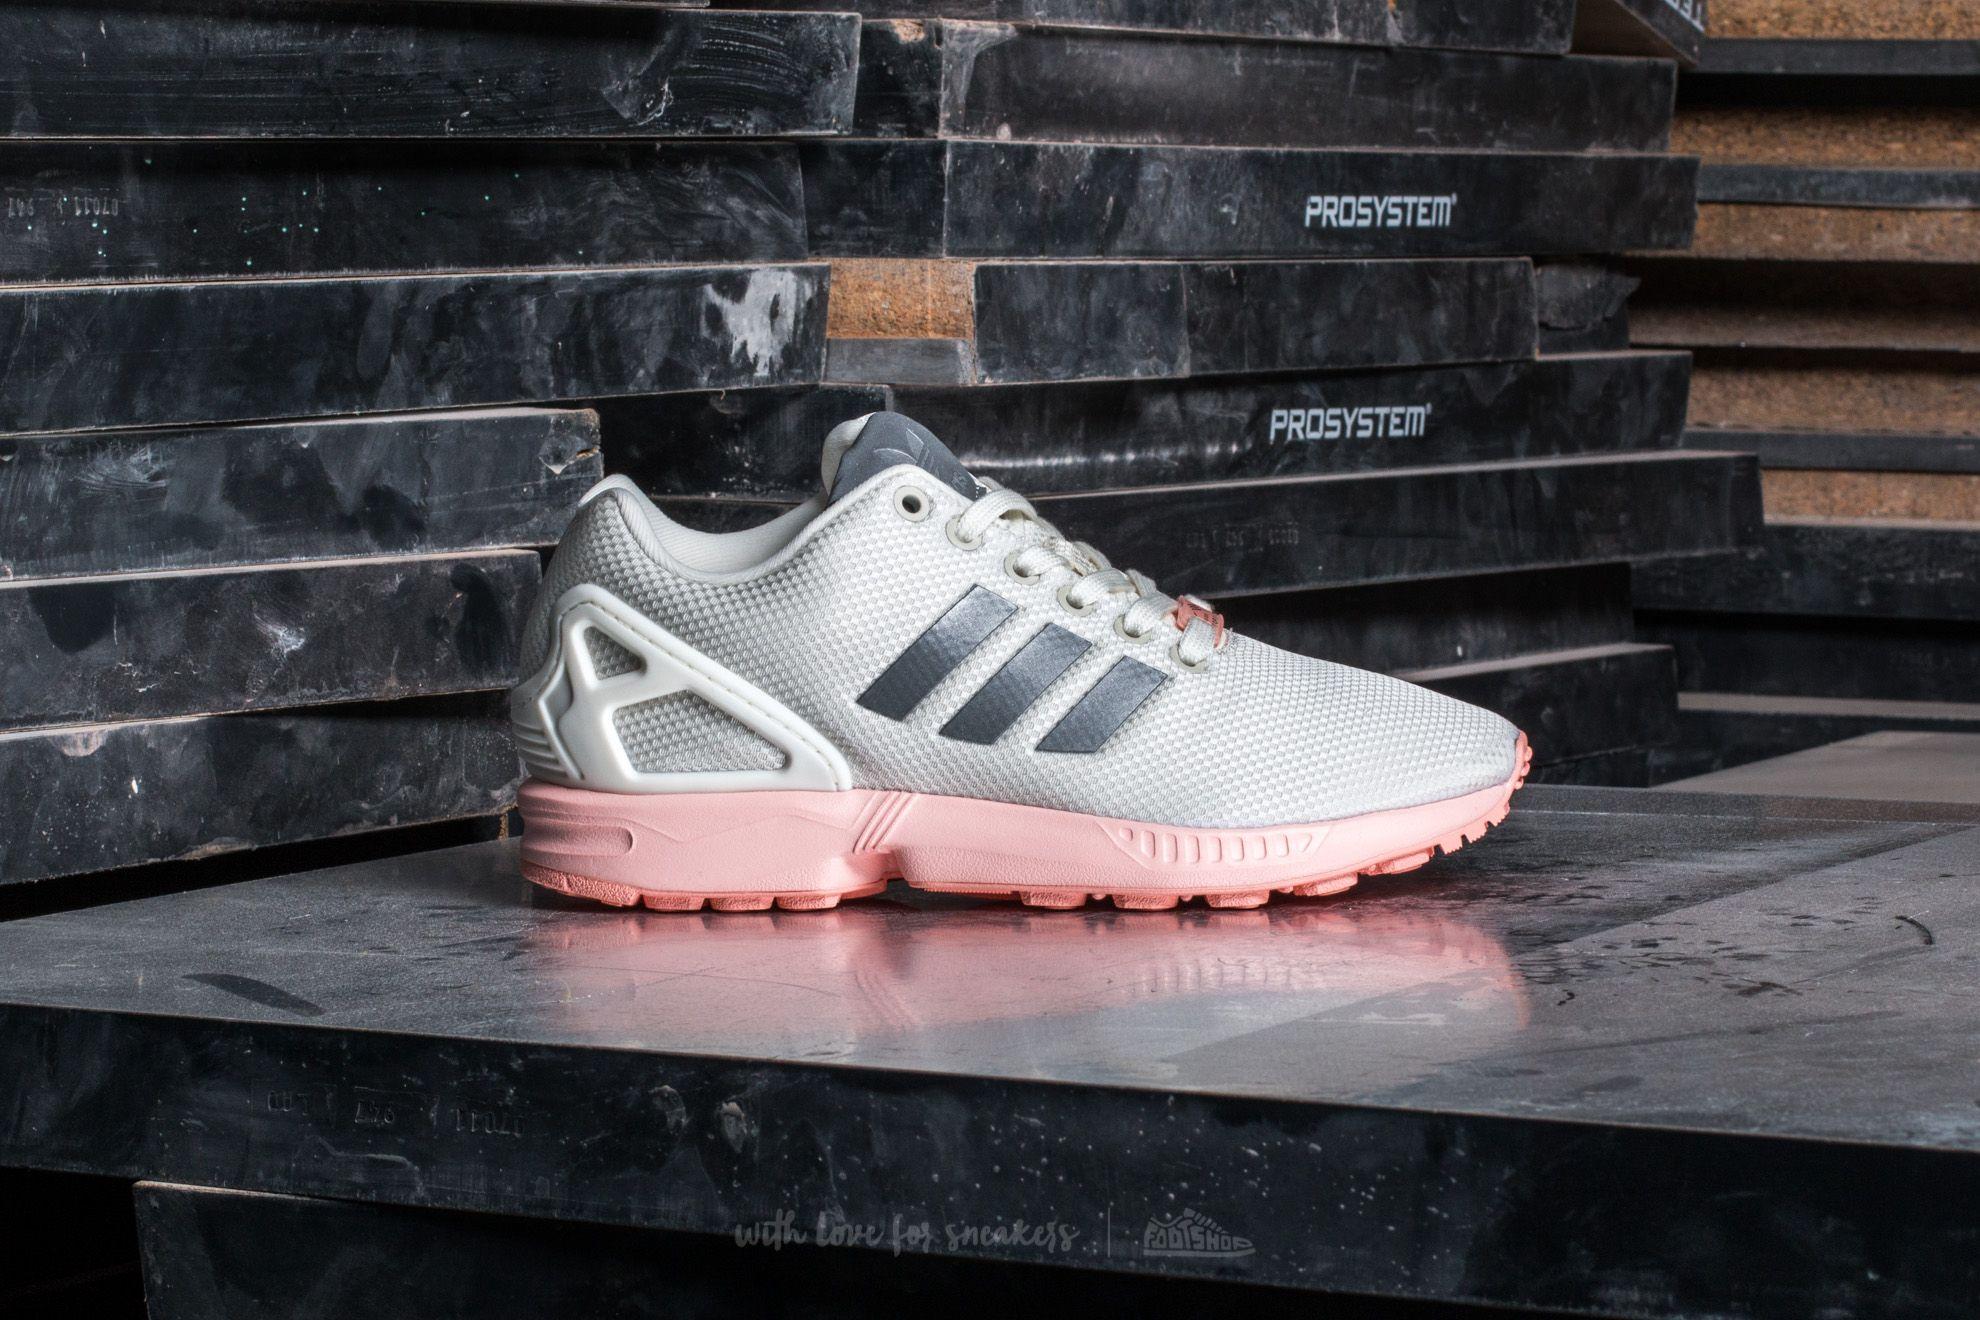 super popular 59be3 19e5a adidas ZX Flux W Ftw White/ Metallic Silver/ Haze Coral ...